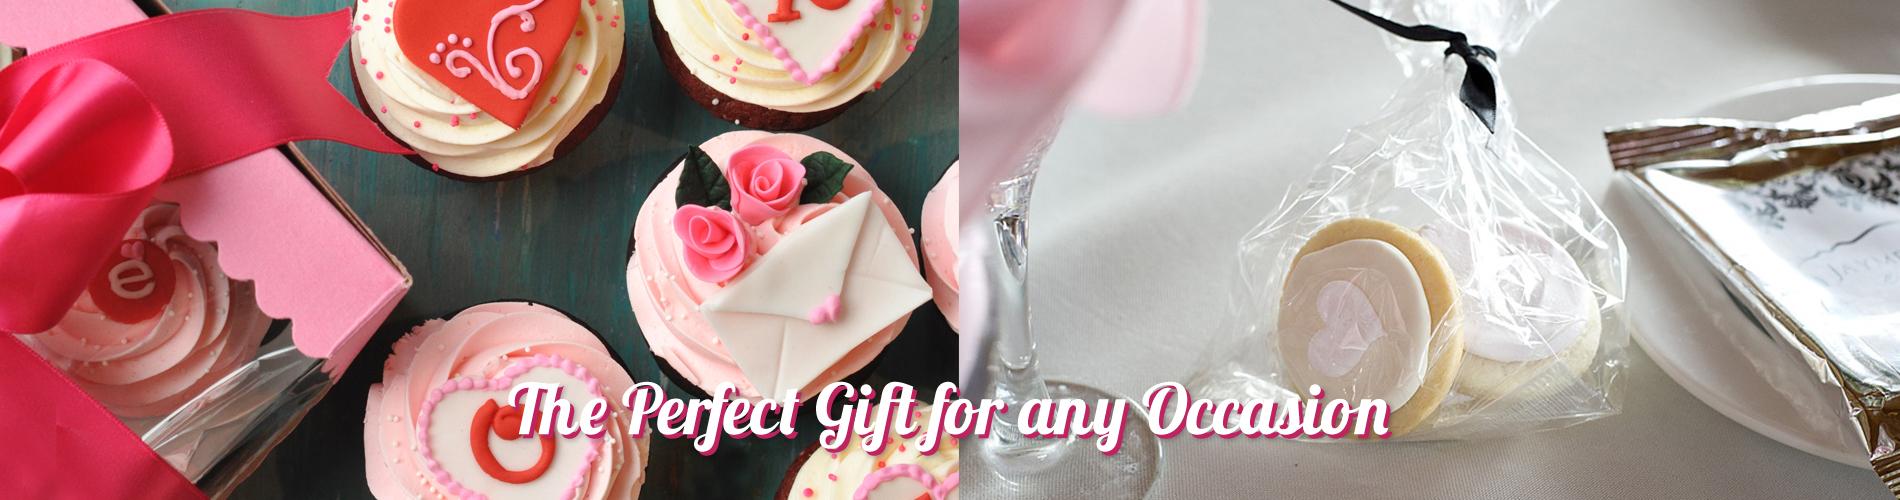 Gift-SweetPeaSlider-1215